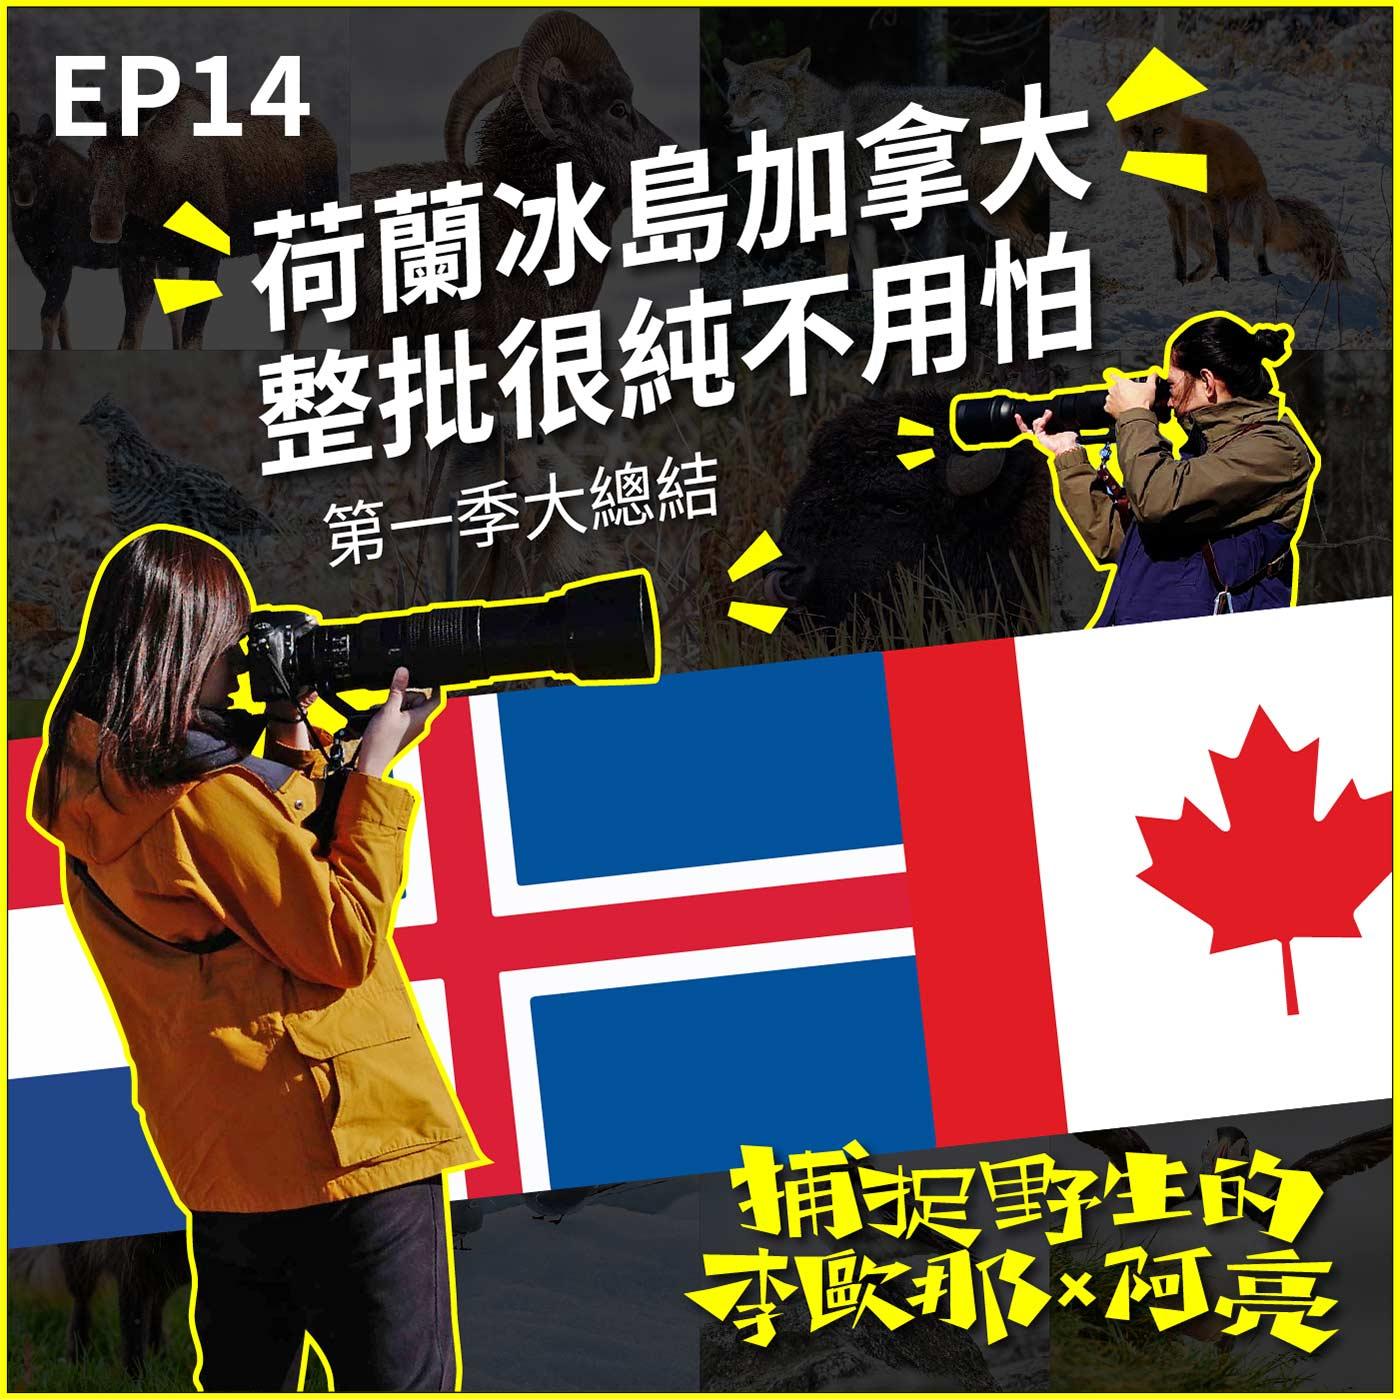 EP.14  荷蘭冰島加拿大 整批很純不用怕 第一季大總結